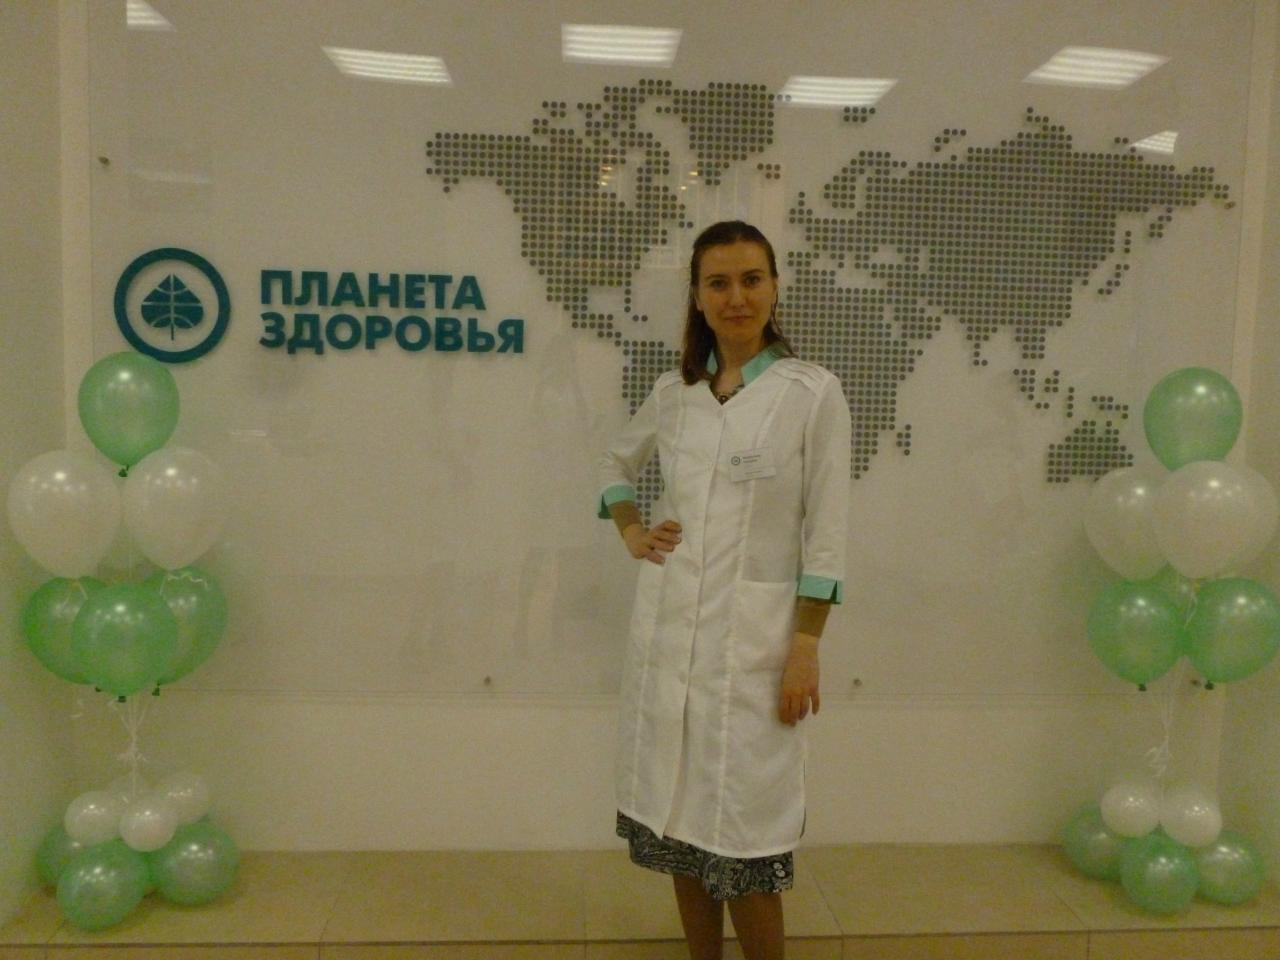 Maroosya Pharmacist